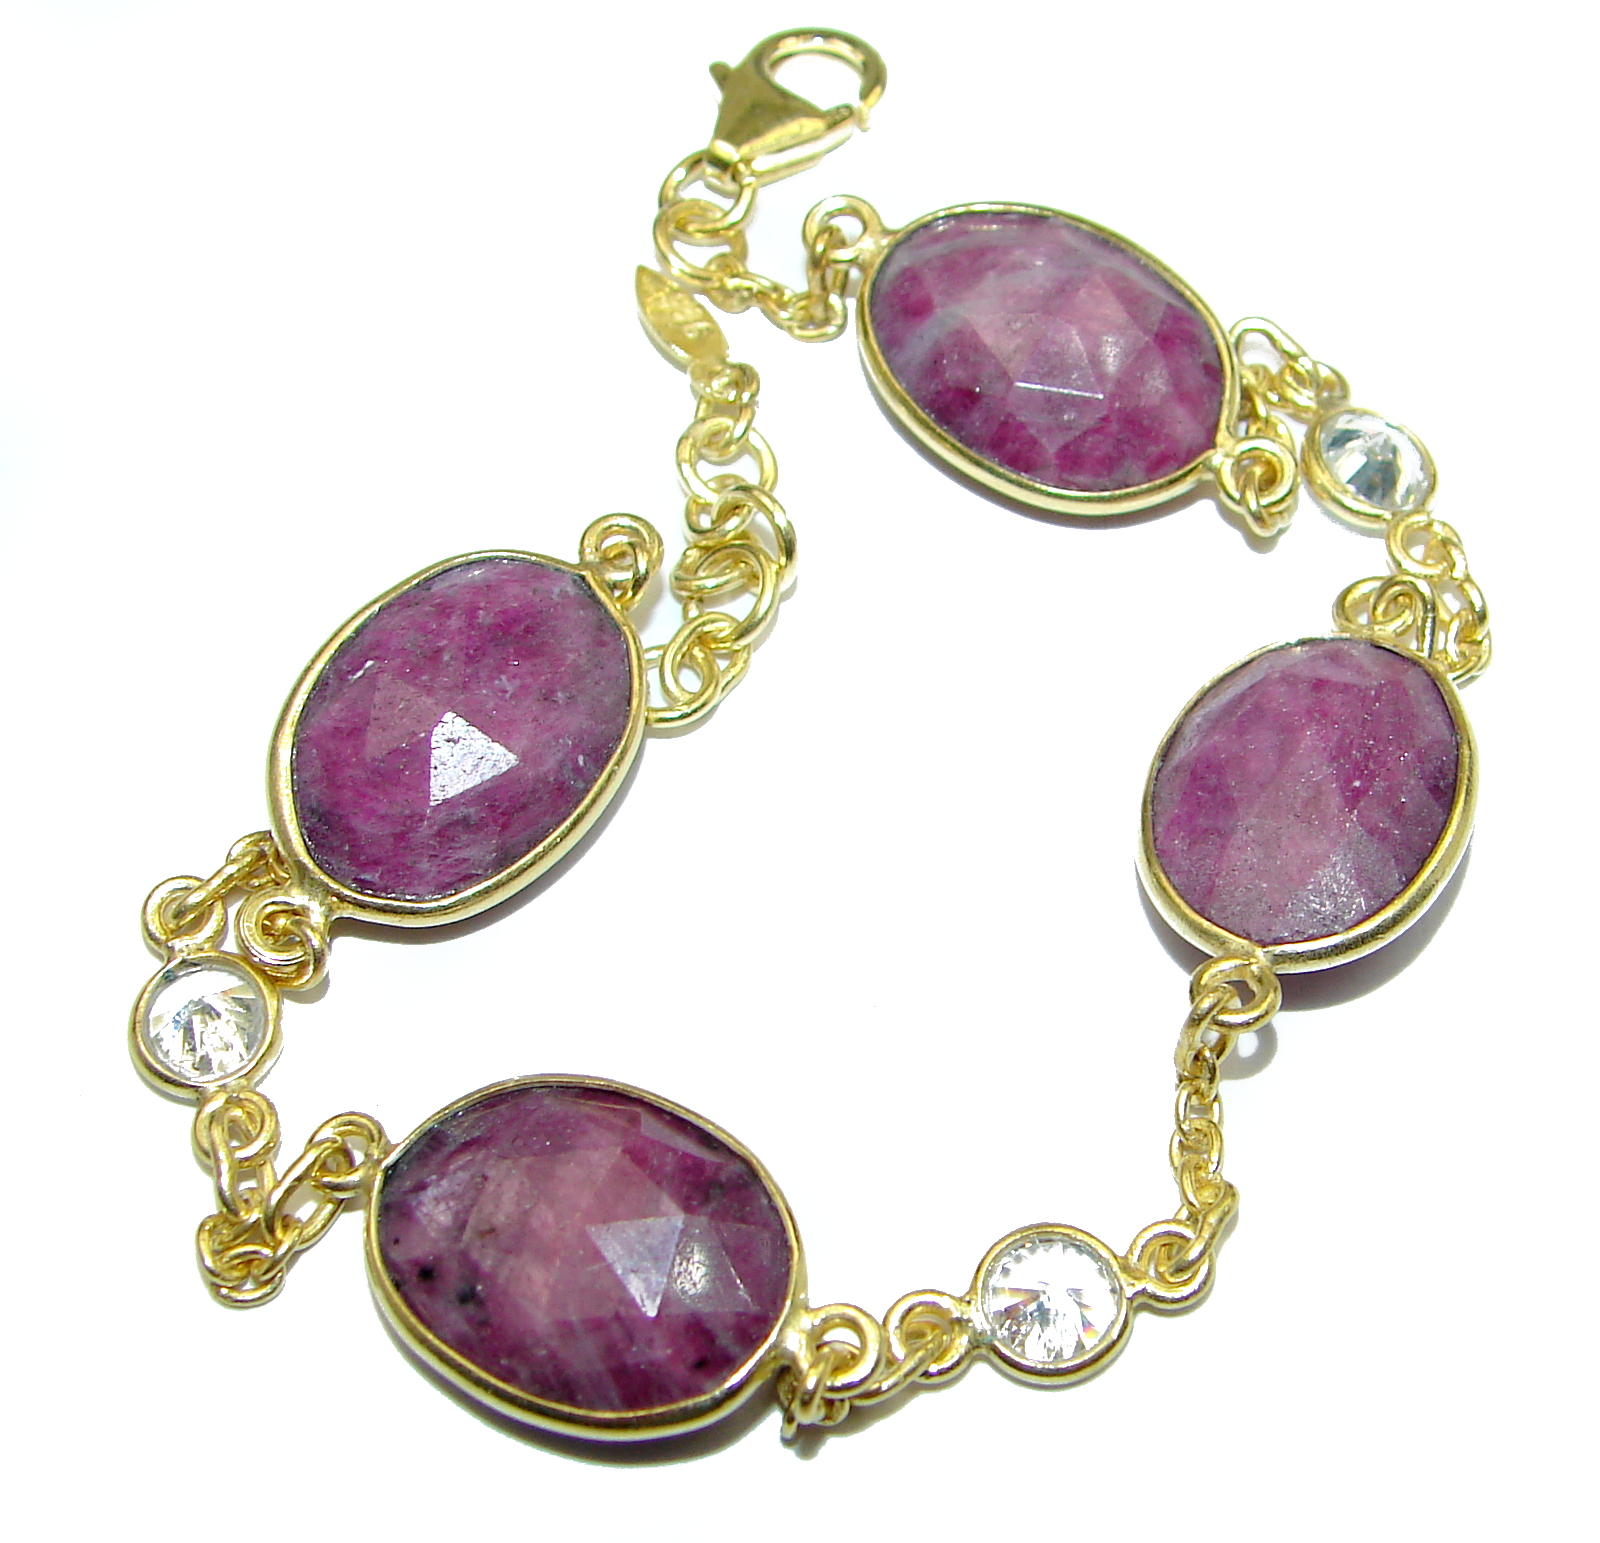 Genuine Ruby 18 ct Gold over .925 Sterling Silver handmade Bracelet